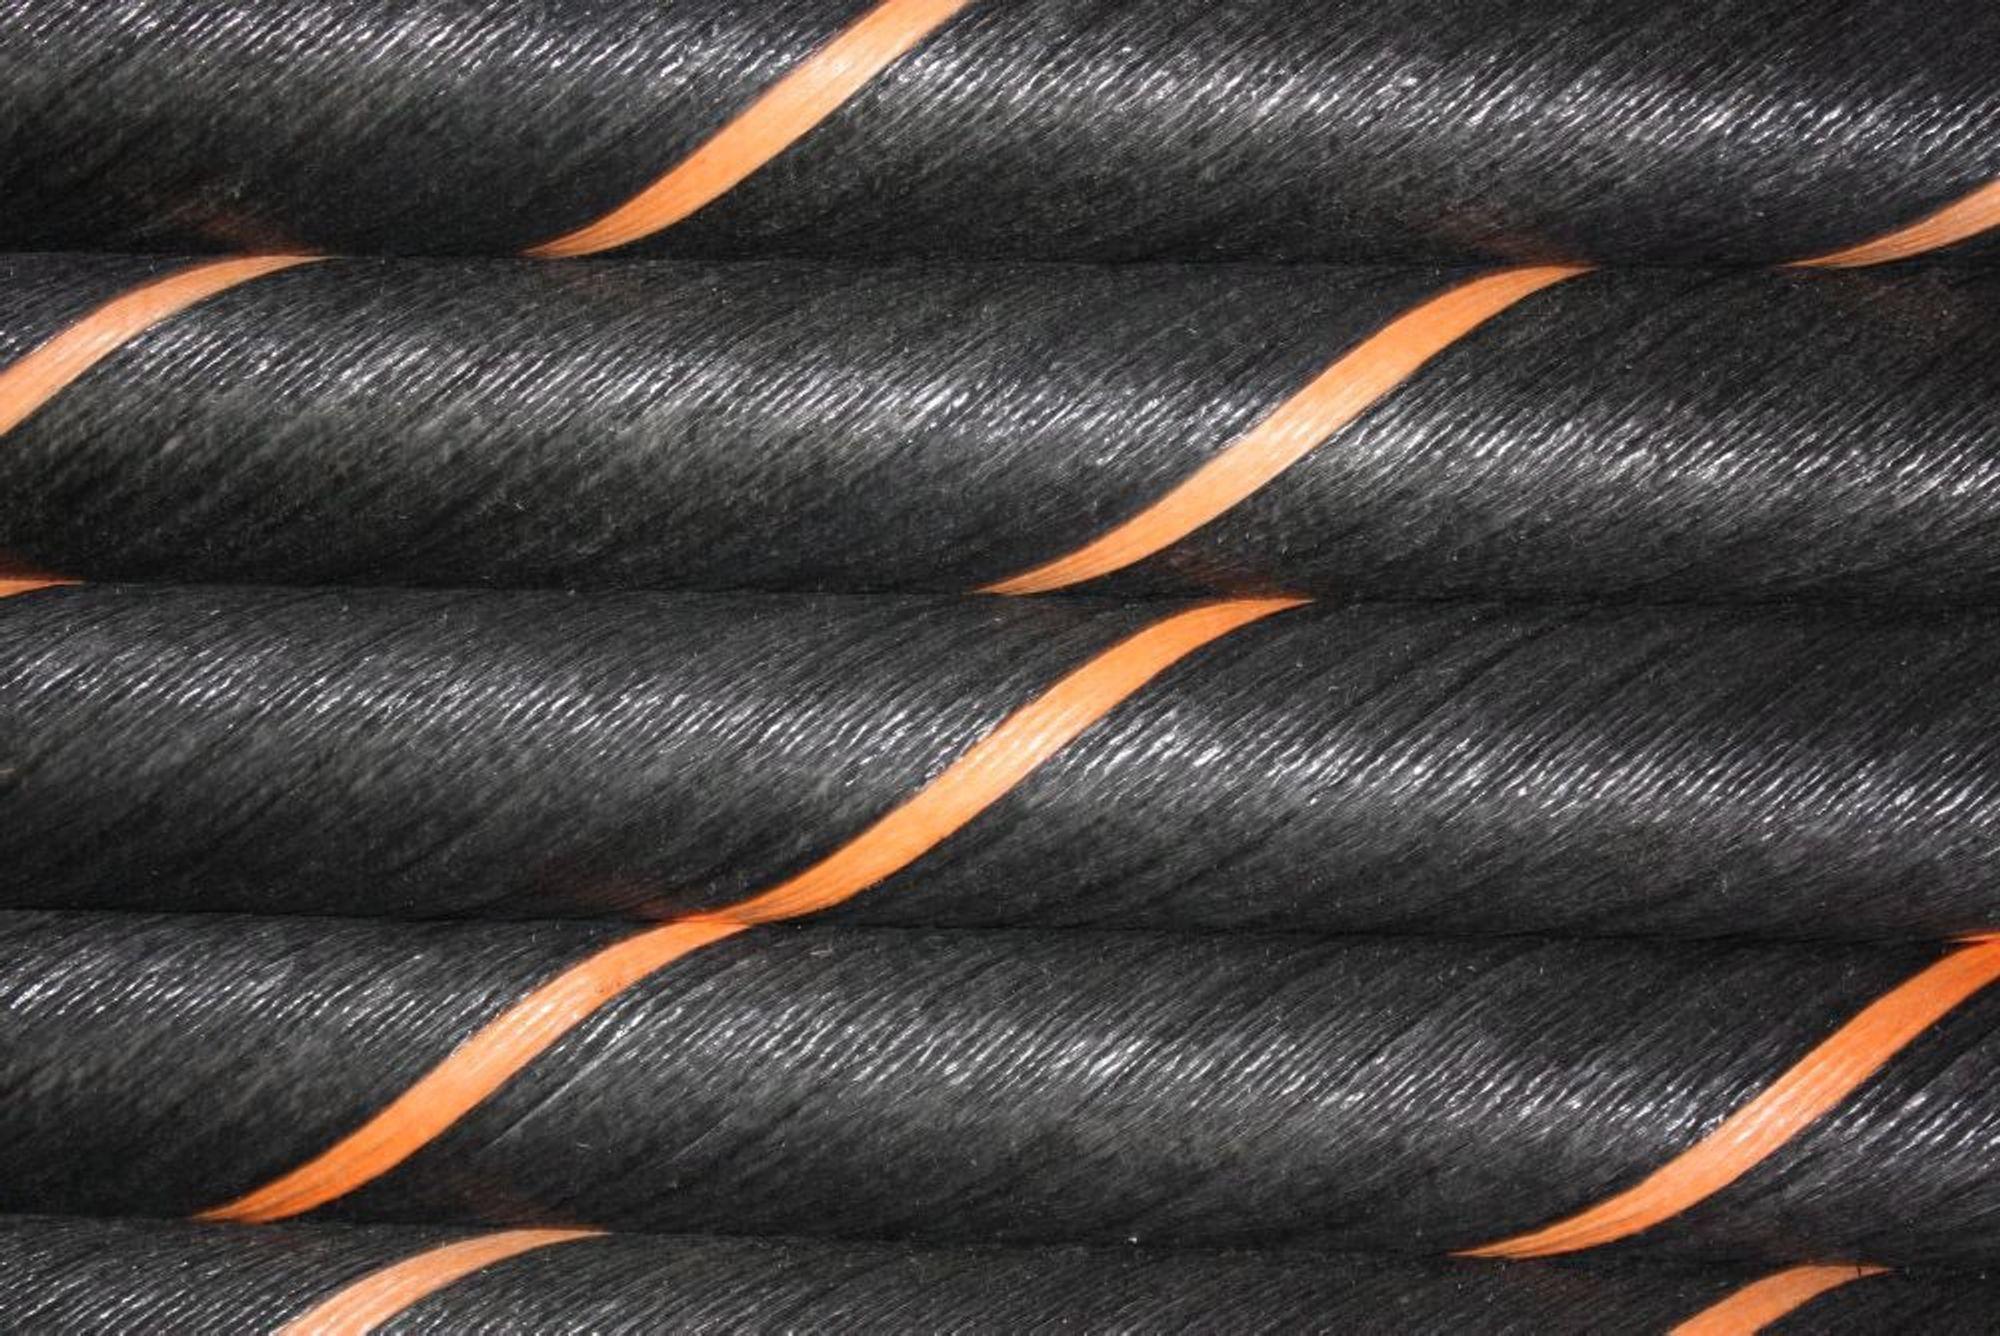 Storbritannia ønsker at Statnetts planlagte kabel skal få være med i kapasitetsmarkedet.